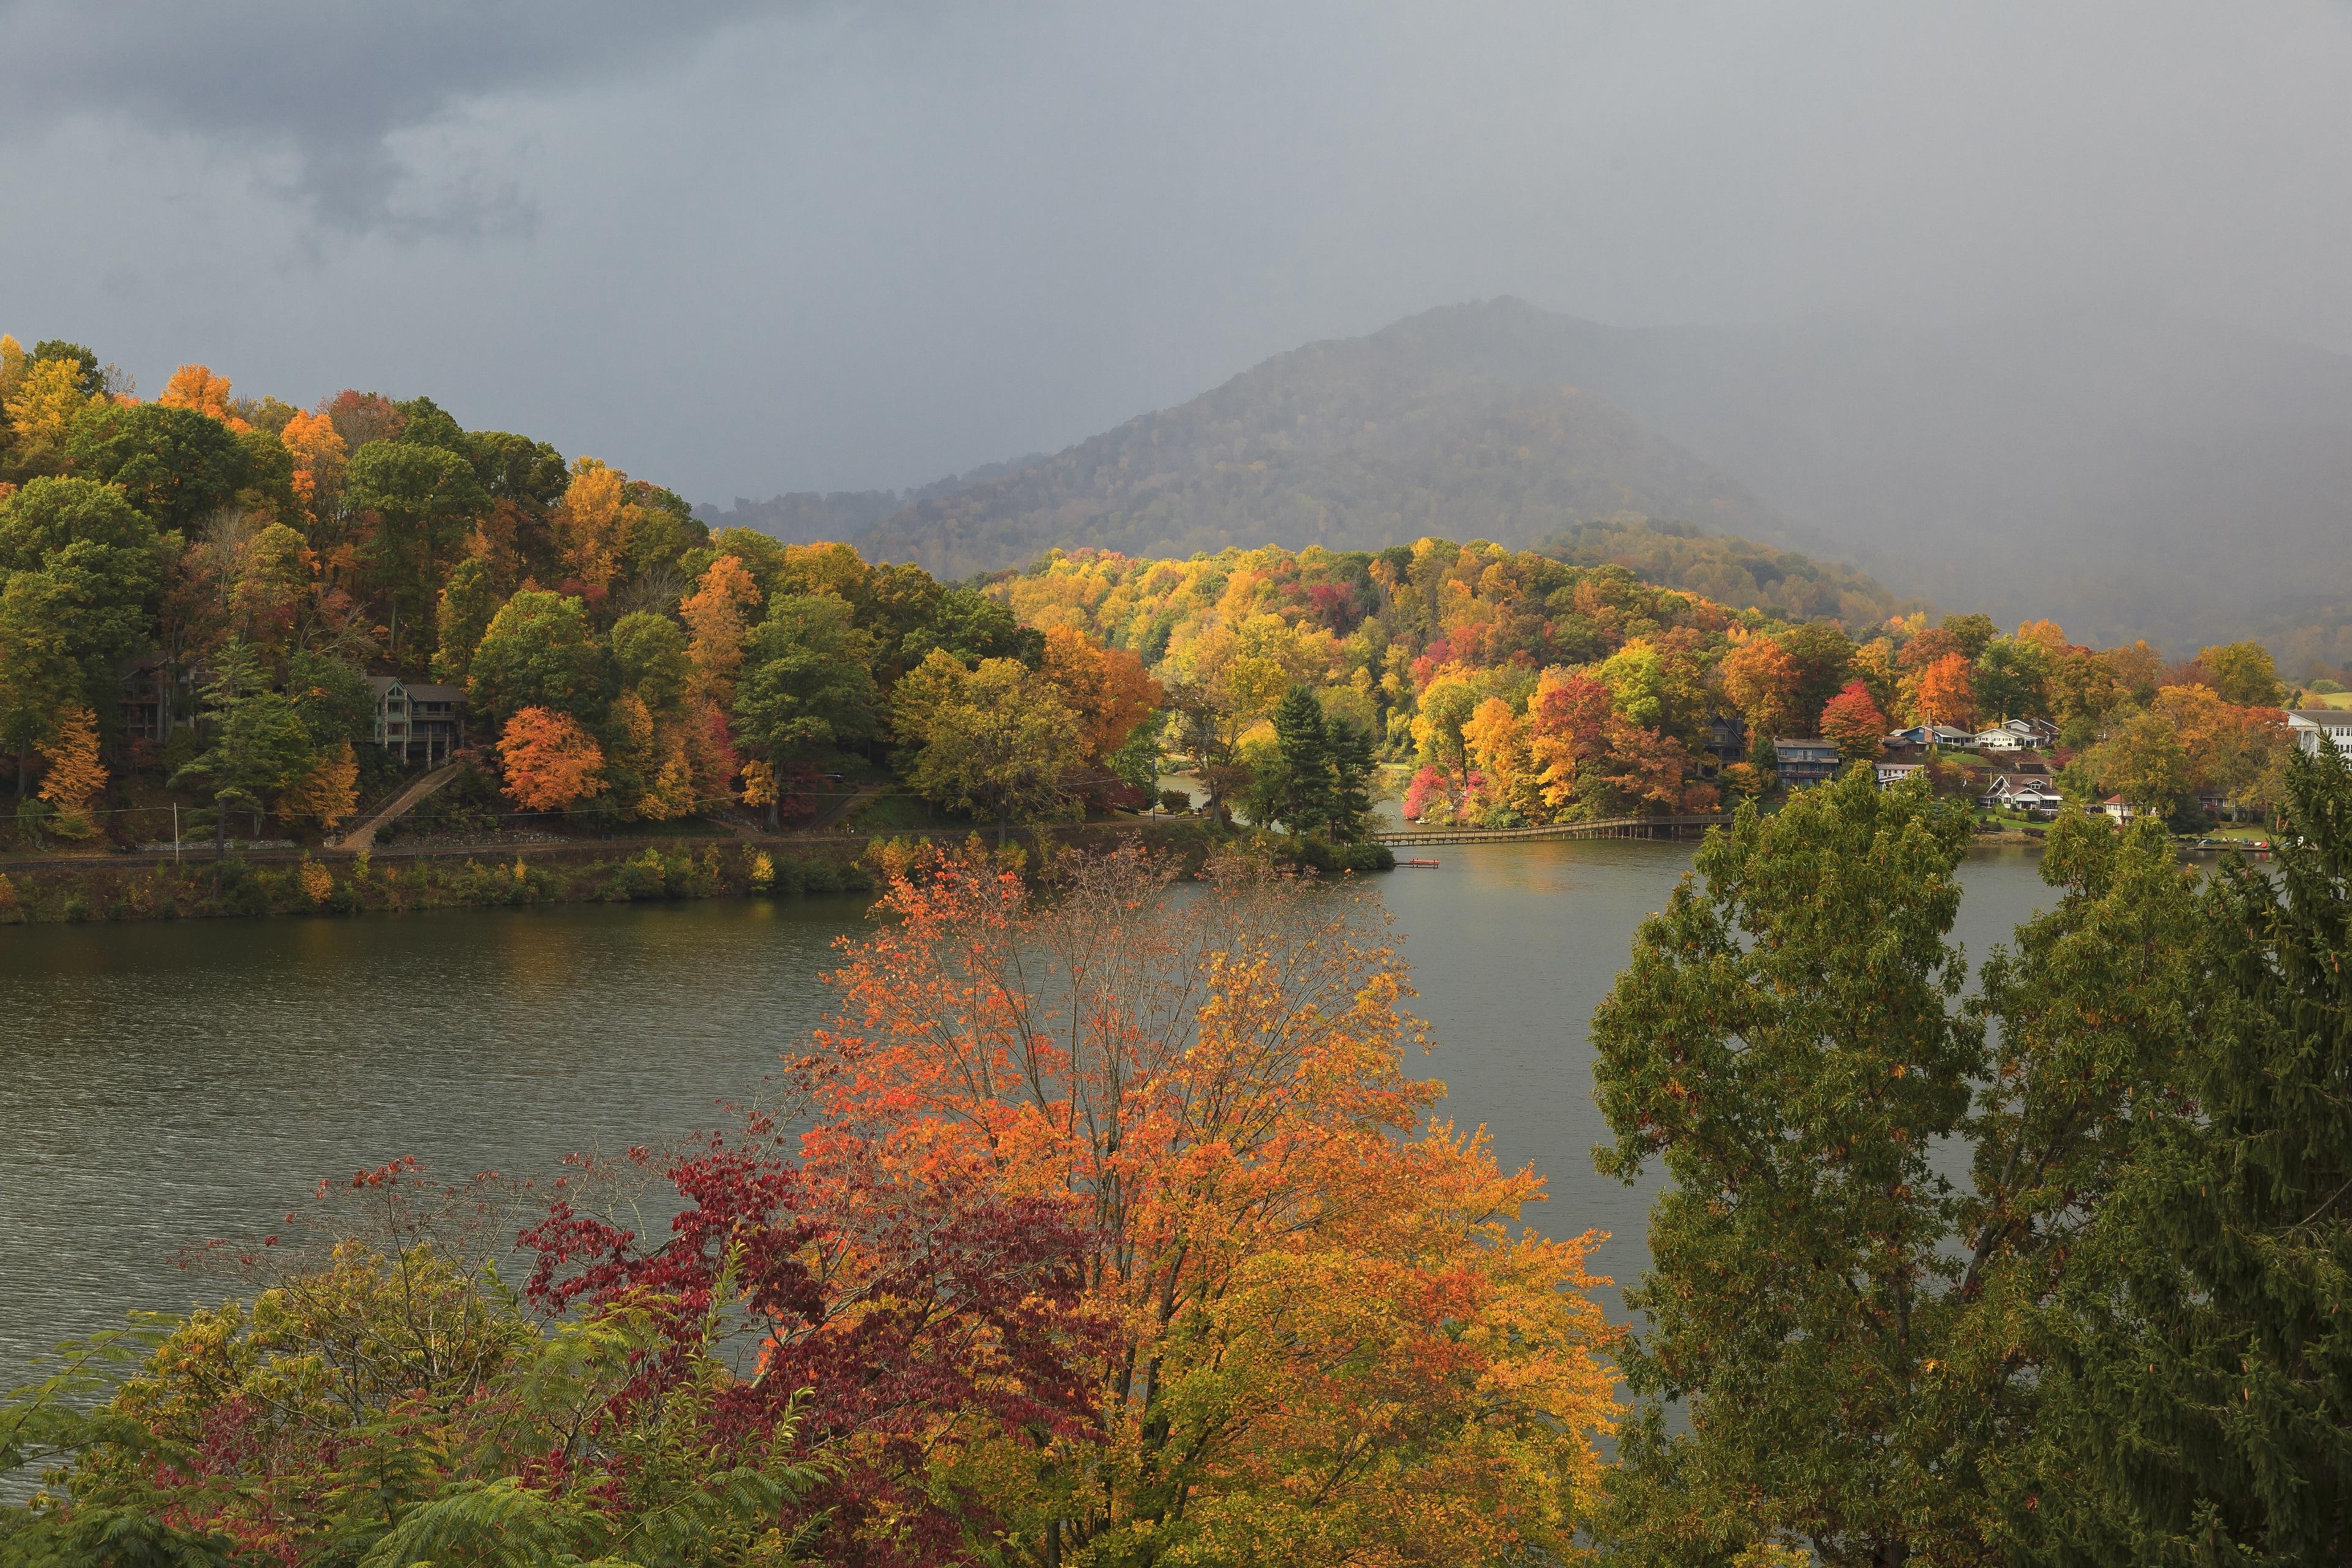 Lake Junaluska, North Carolina, United States of America